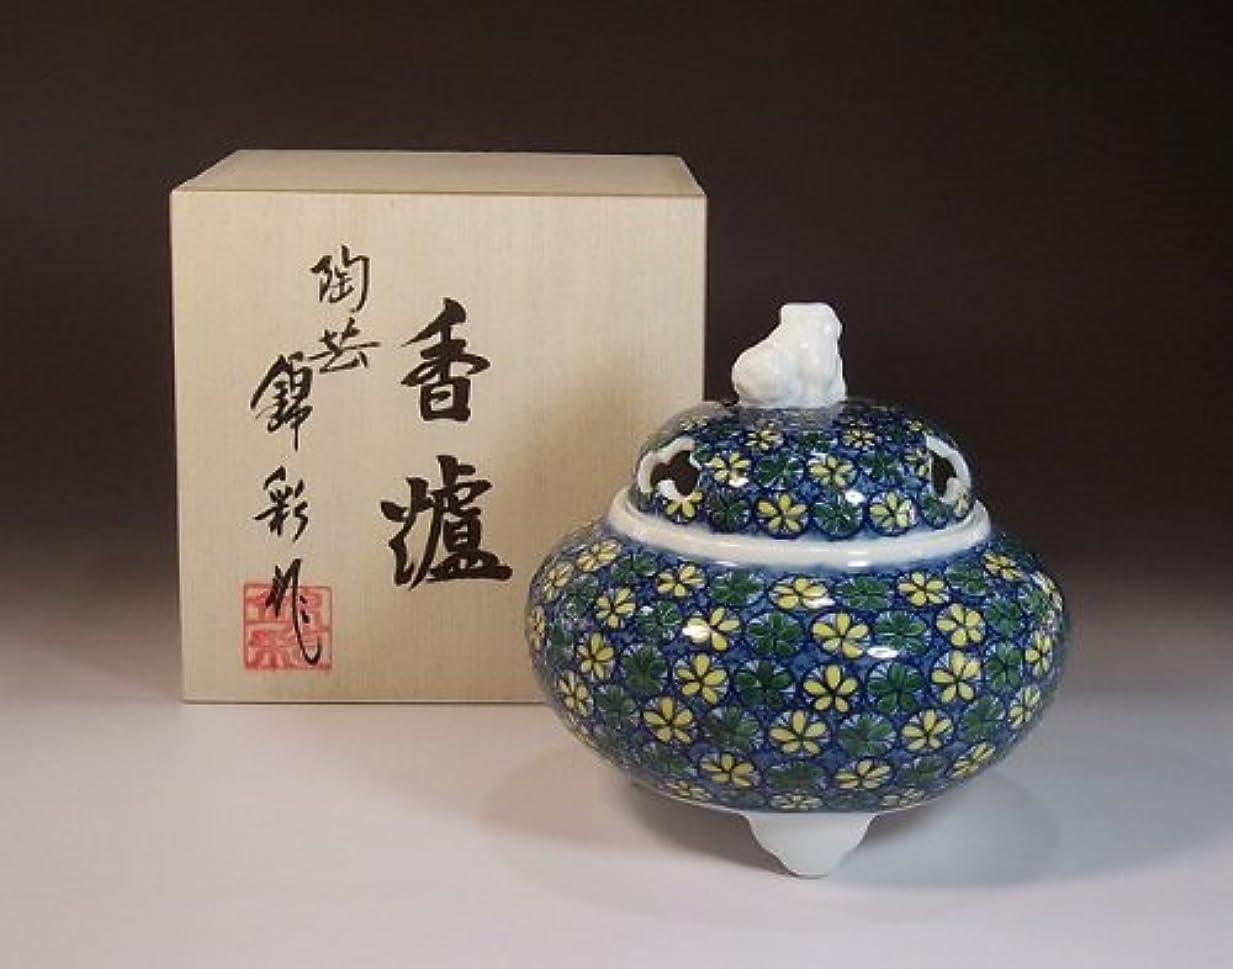 起訴する許容横有田焼・伊万里焼の高級香炉陶器|贈答品|ギフト|記念品|贈り物|小花文様・陶芸家 藤井錦彩